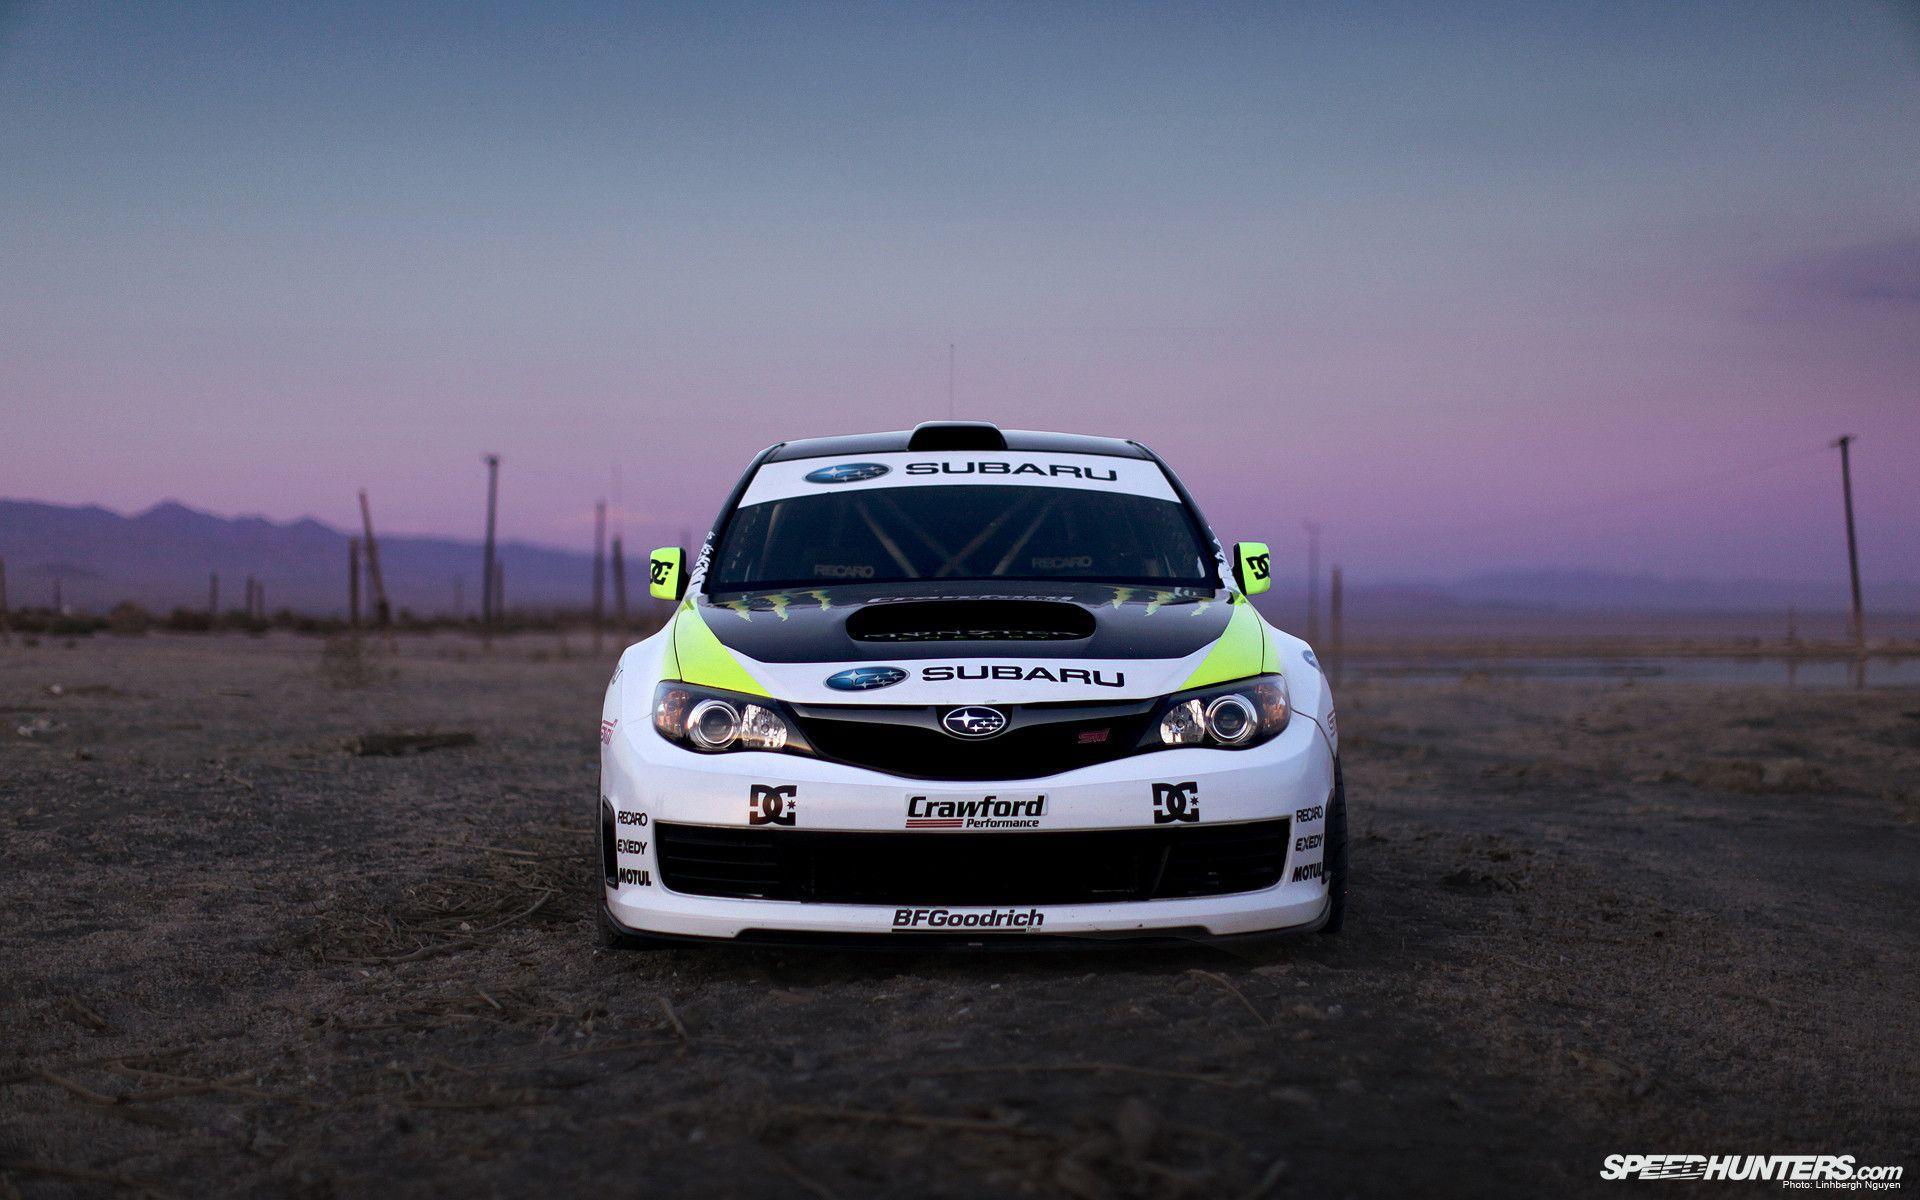 Subaru Hd Wallpapers Wallpaper Cave